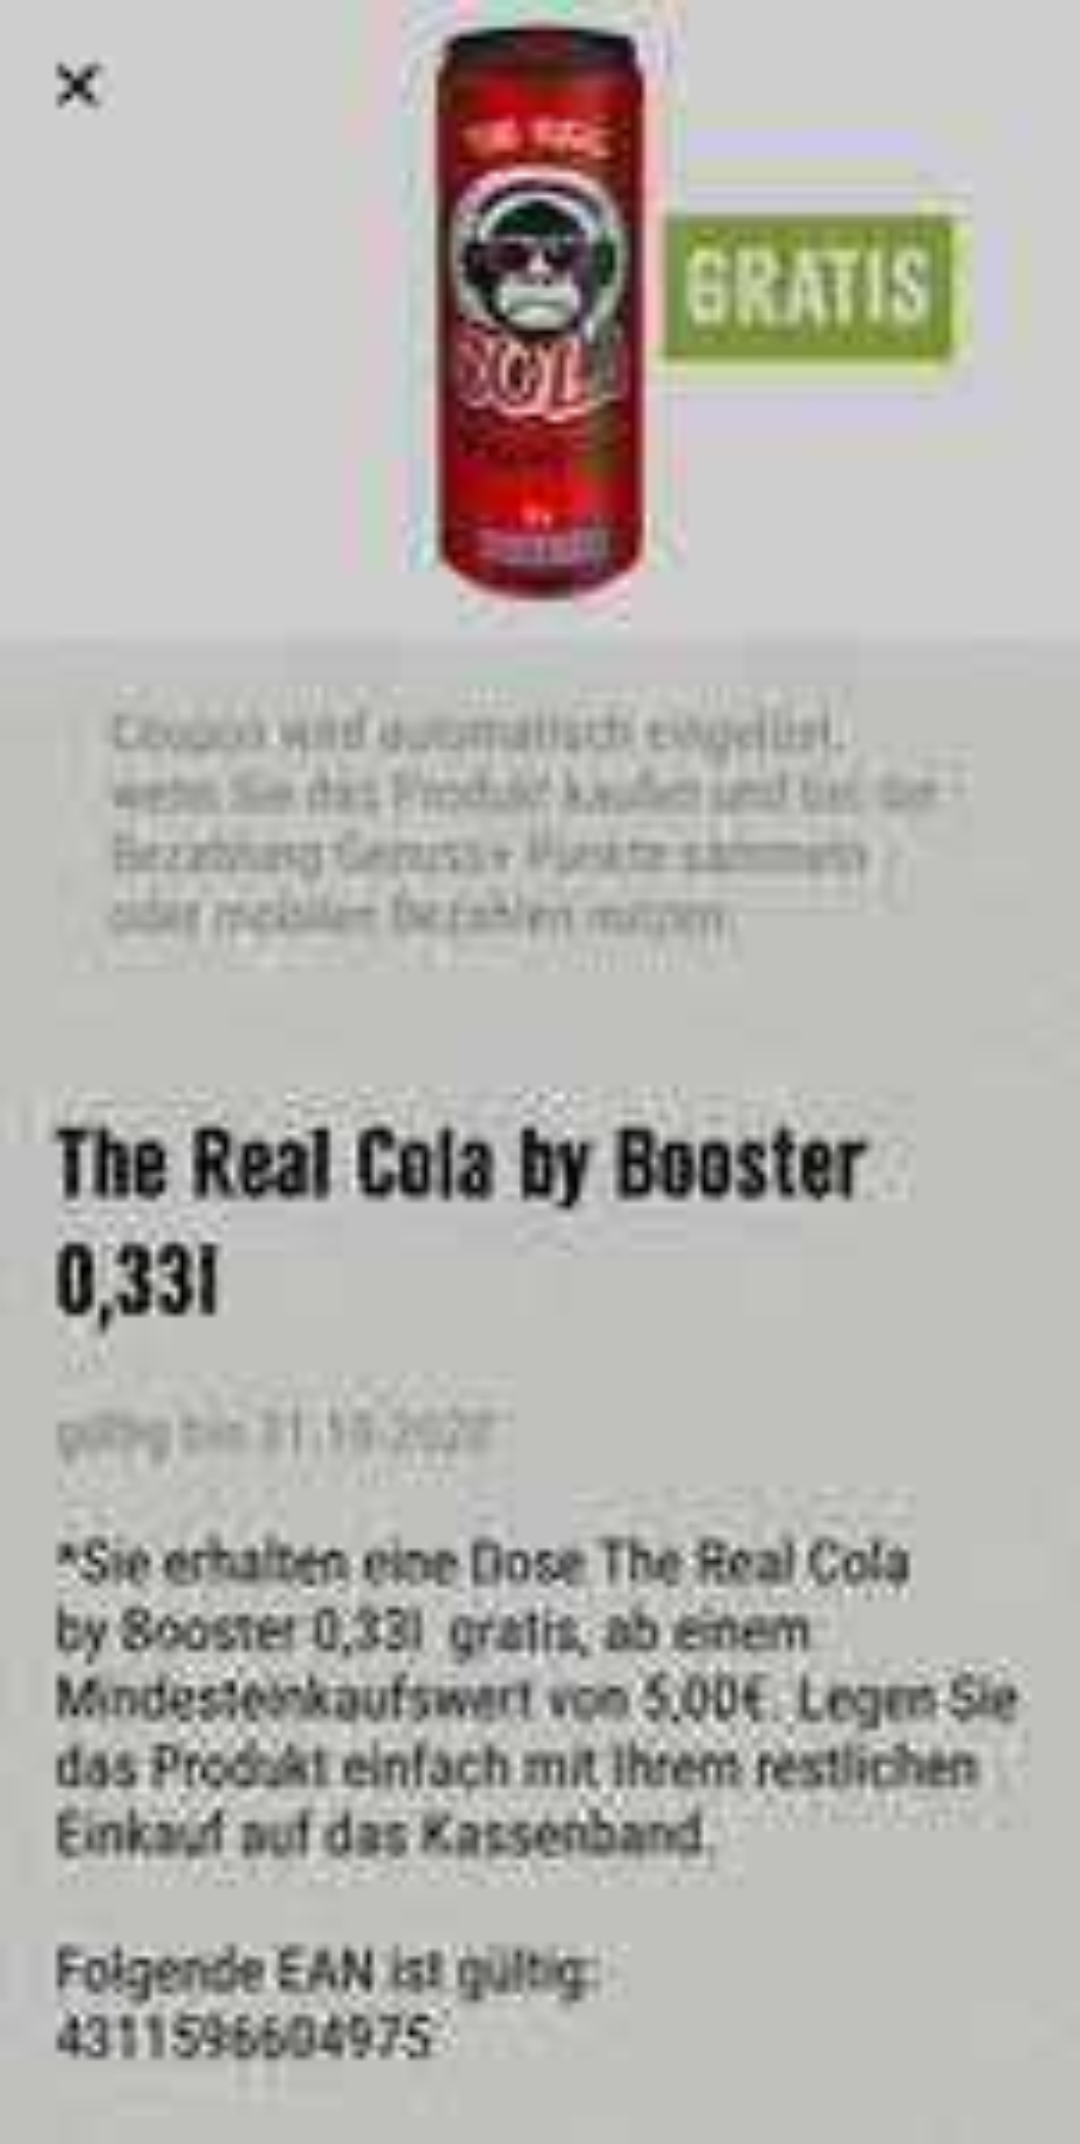 [Edeka Genuss+ App / Lokal / Baden-Württemberg] The Real Cola by Booster (Mindesteinkauf 5,00 EUR)